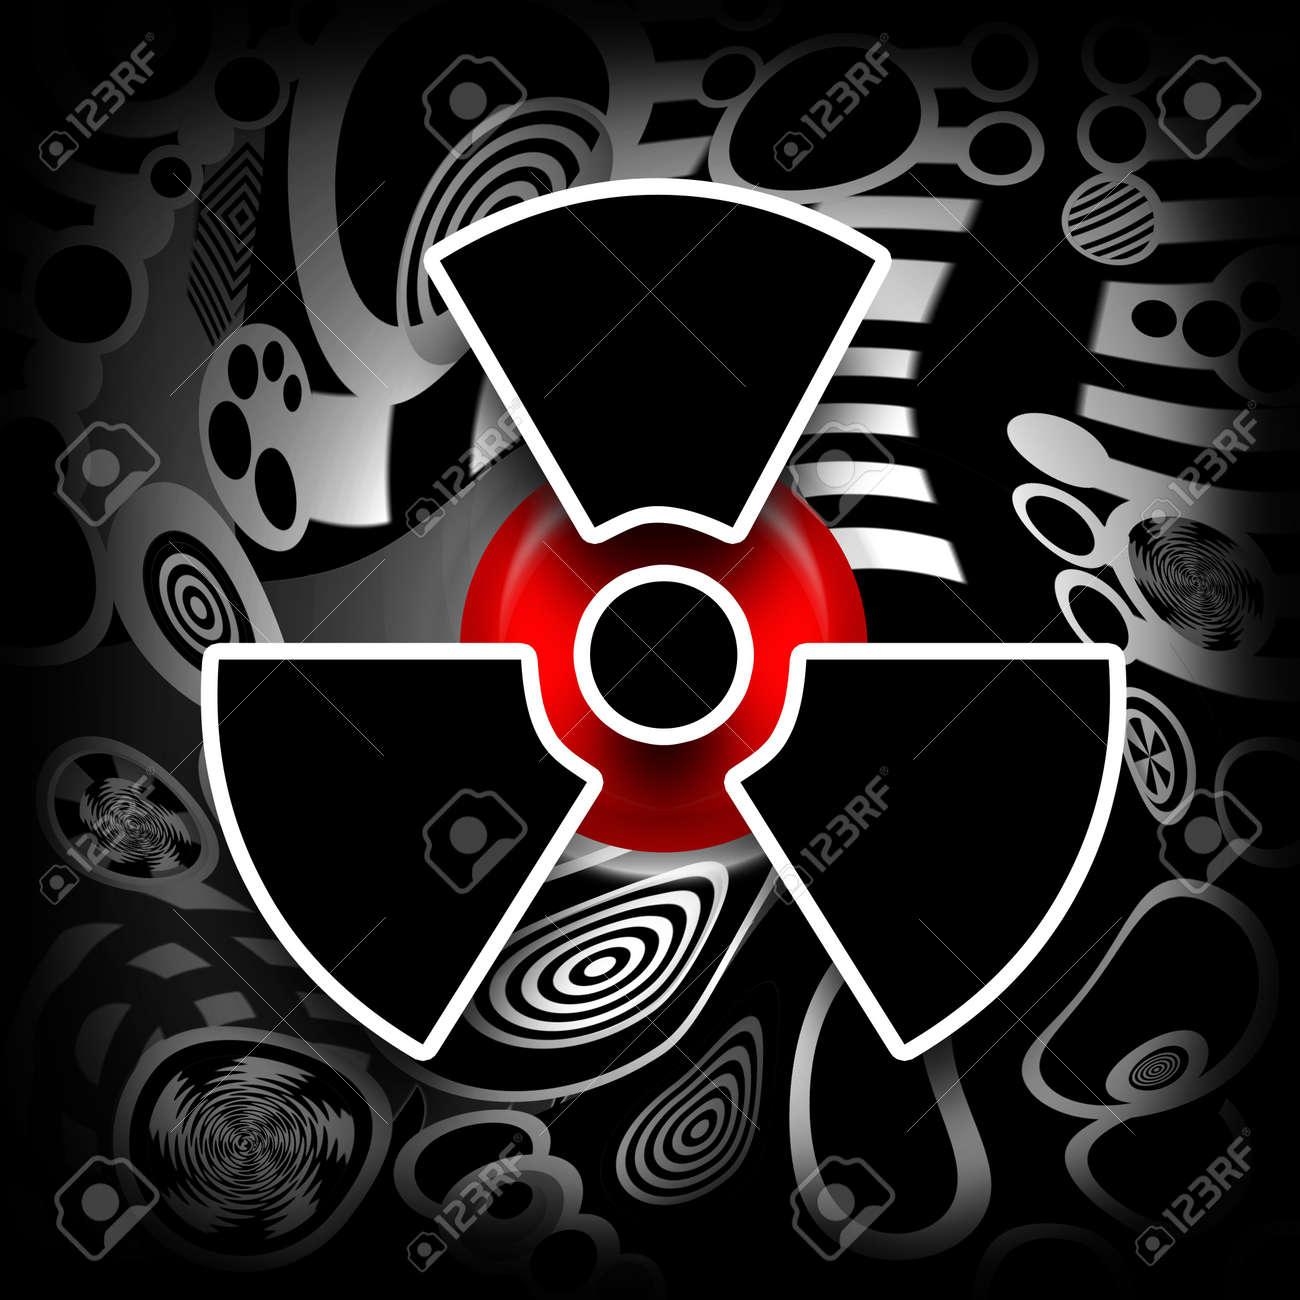 Nuclear meltdown black radioactive symbol on melting industrial nuclear meltdown black radioactive symbol on melting industrial metal background stock photo 9283466 buycottarizona